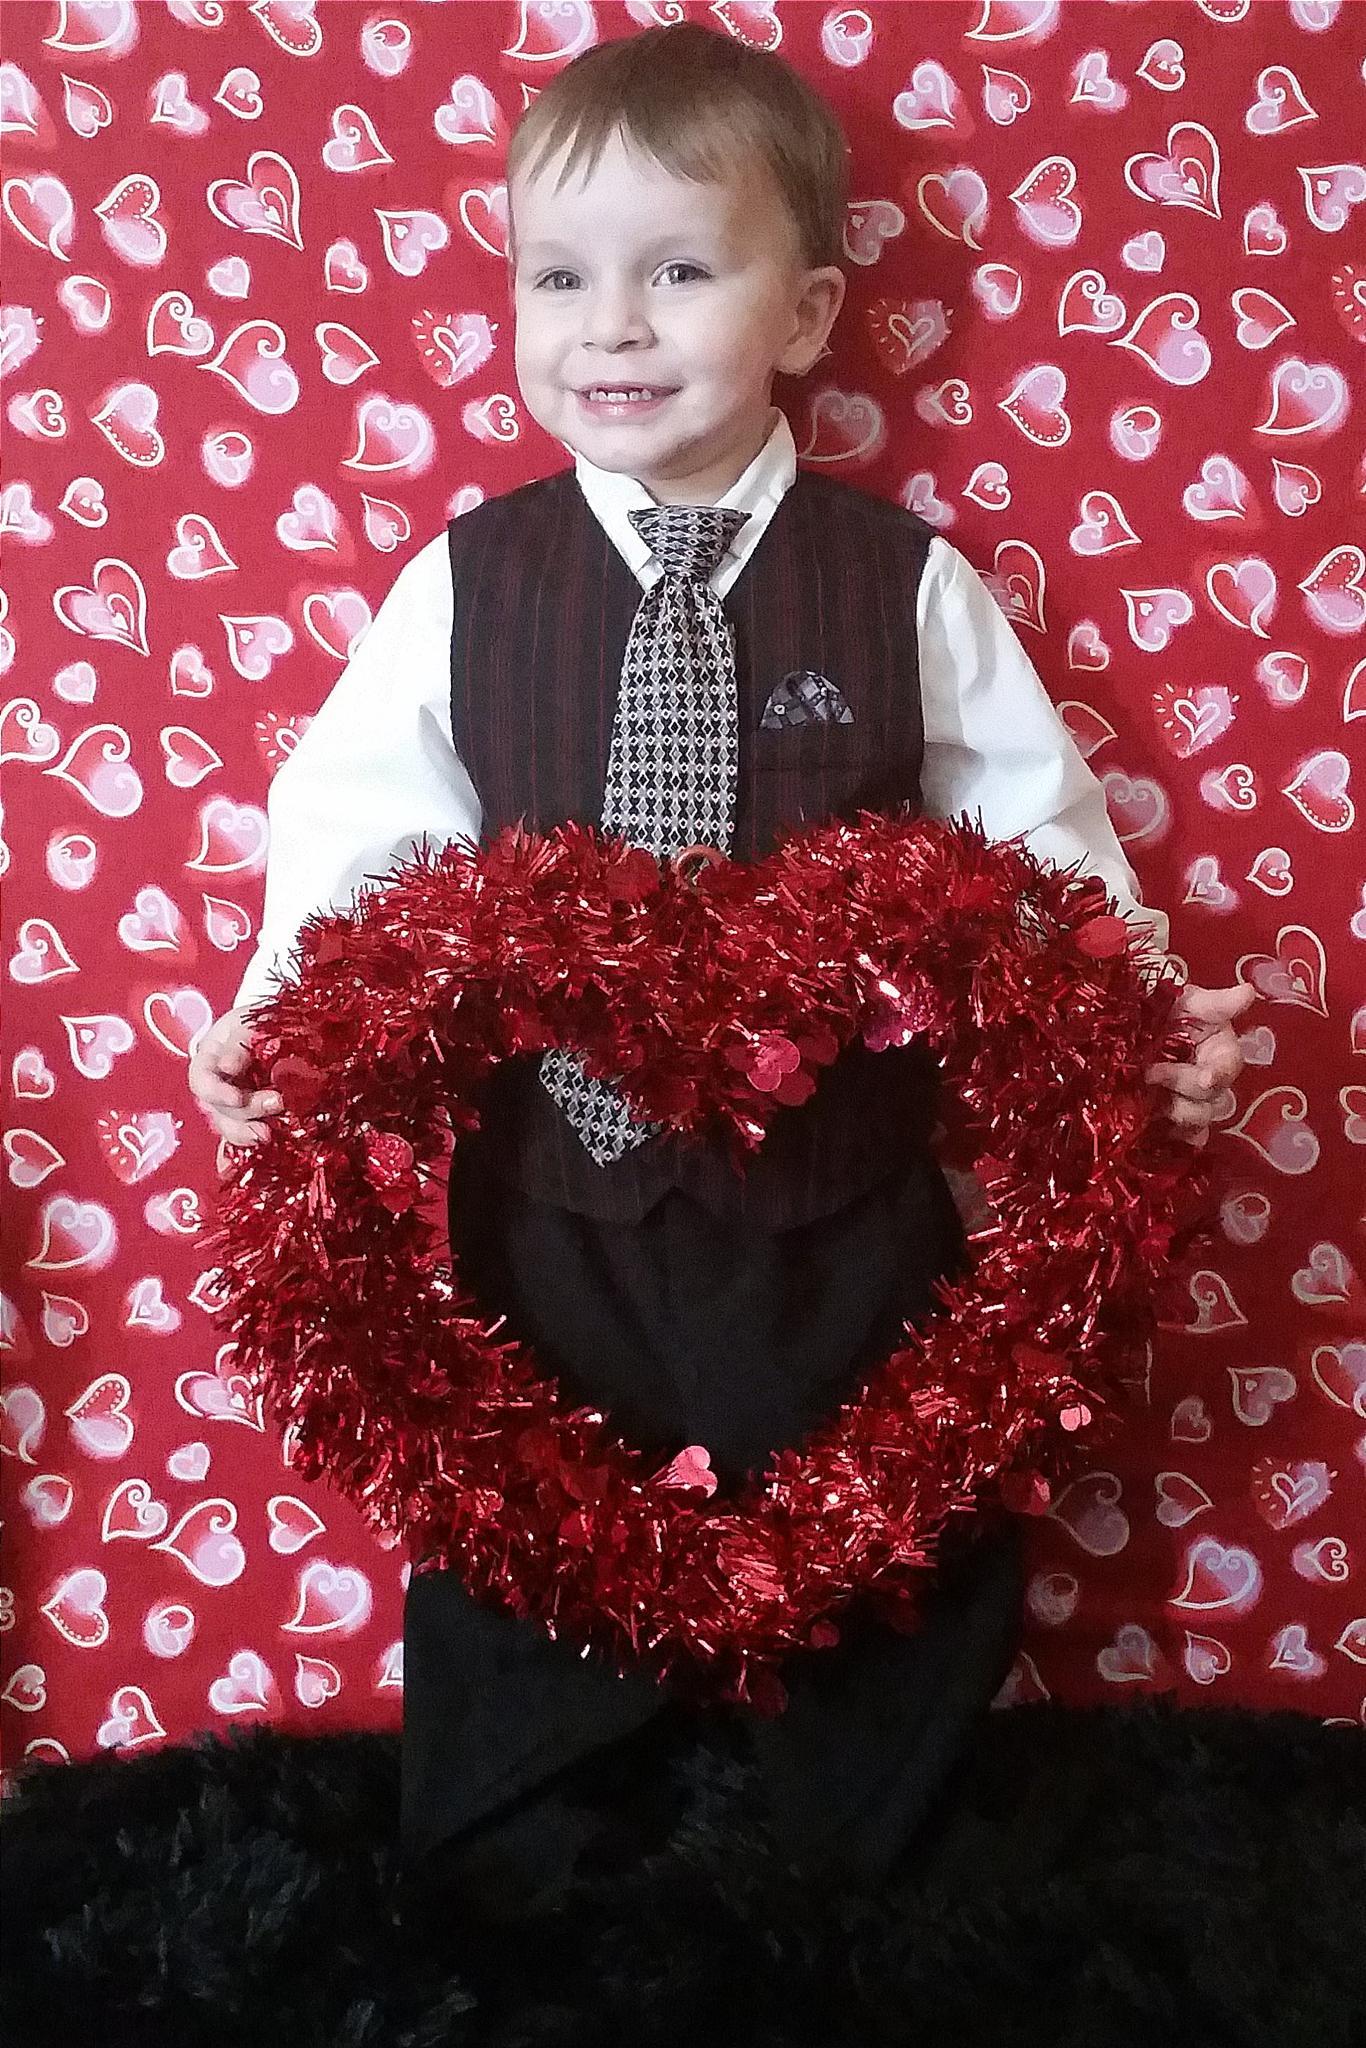 Ready For Valentines by Jasmina Heich